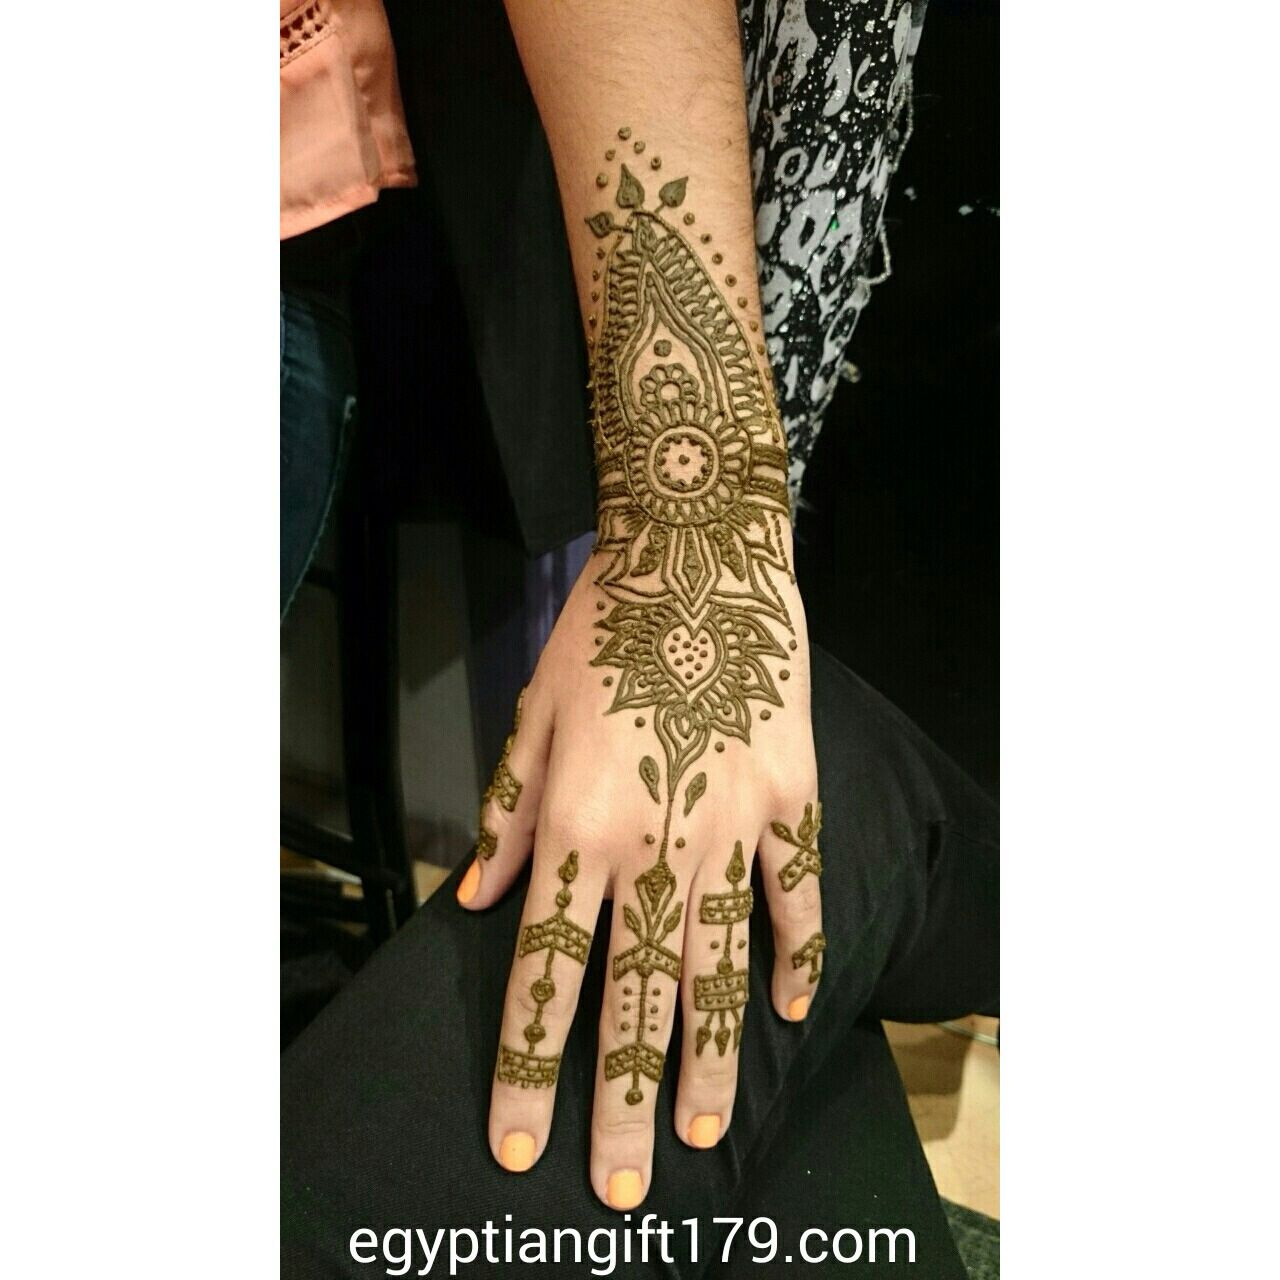 Egyptian gift corner tattoo near me tattoos henna shop